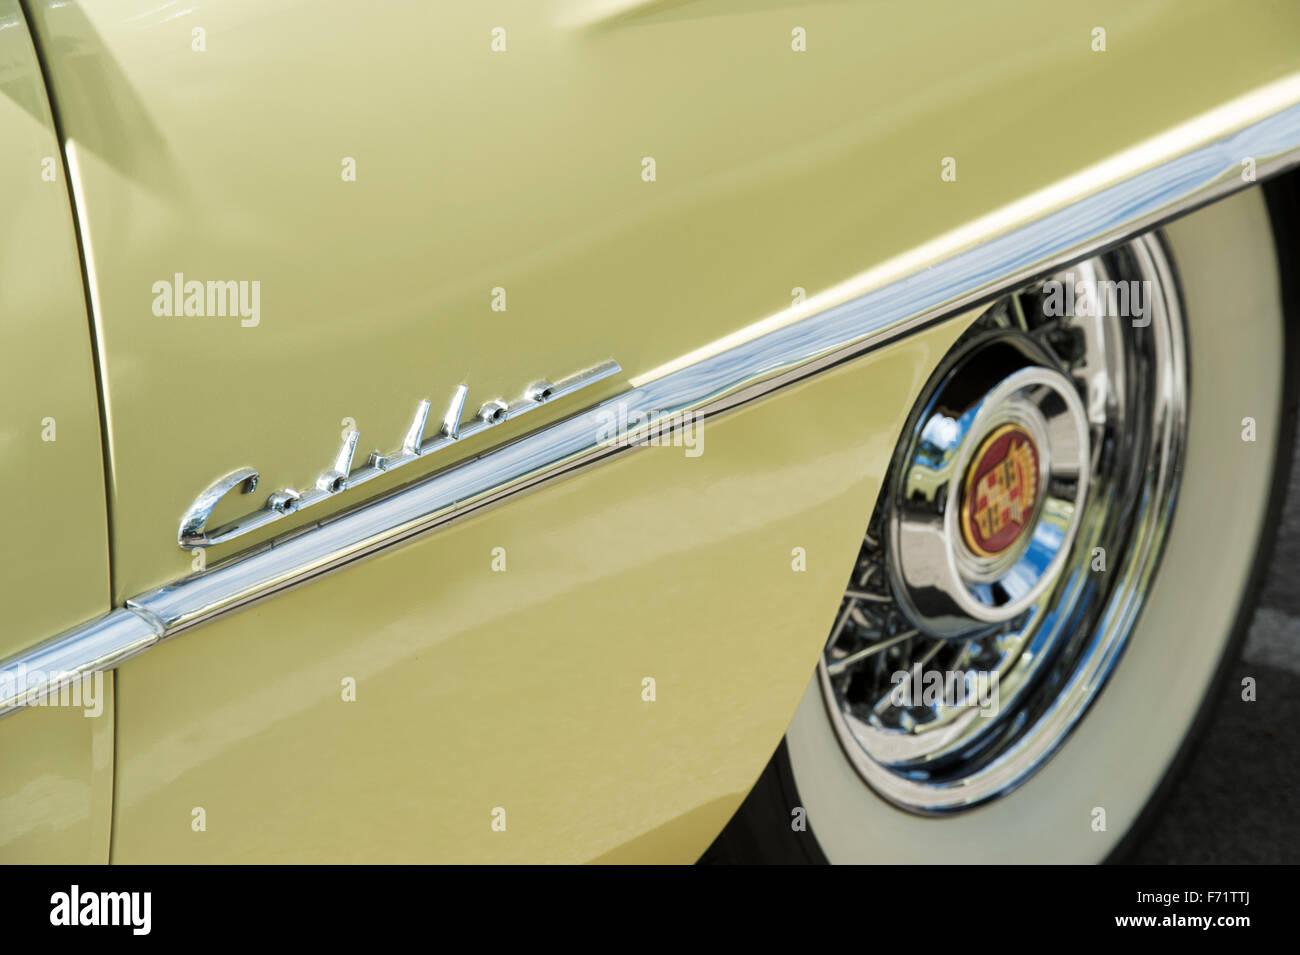 1954 Cadillac Eldorado Convertible Stock Photos El Dorado Car Detail Image